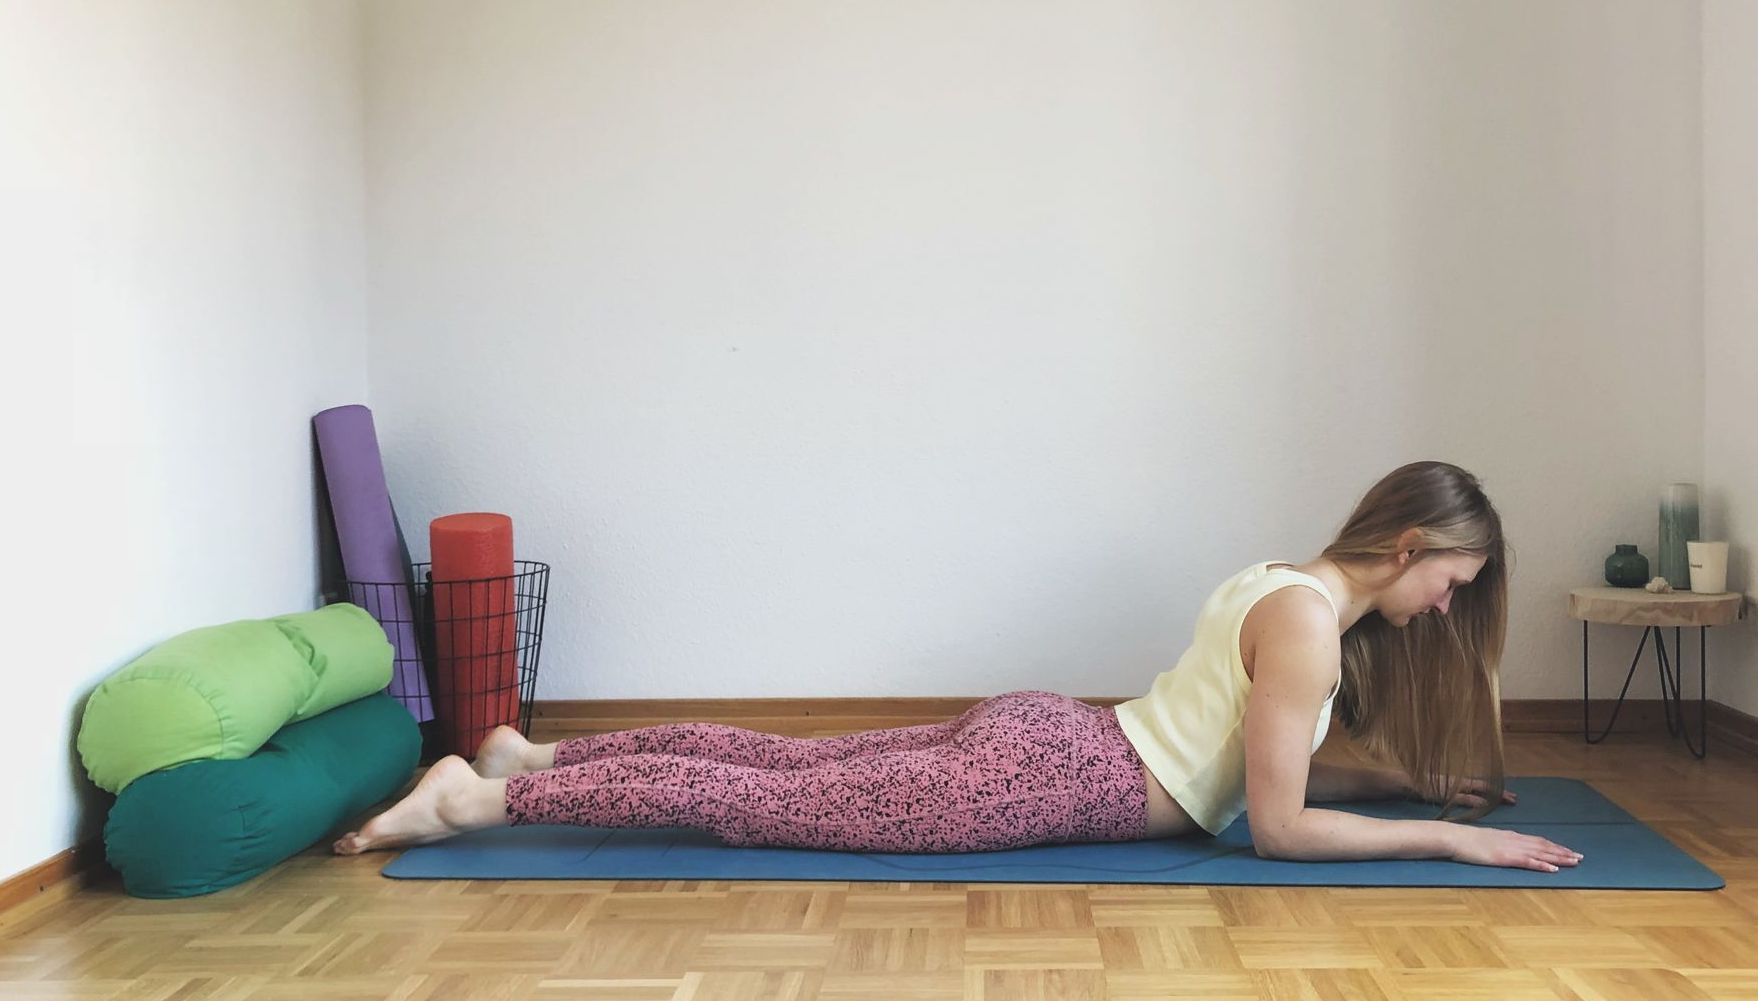 Yin-Yoga-Tutorial-Herzöffnung-Heart-Sphinx-Asana-Rückbeuge-OhYesYoga